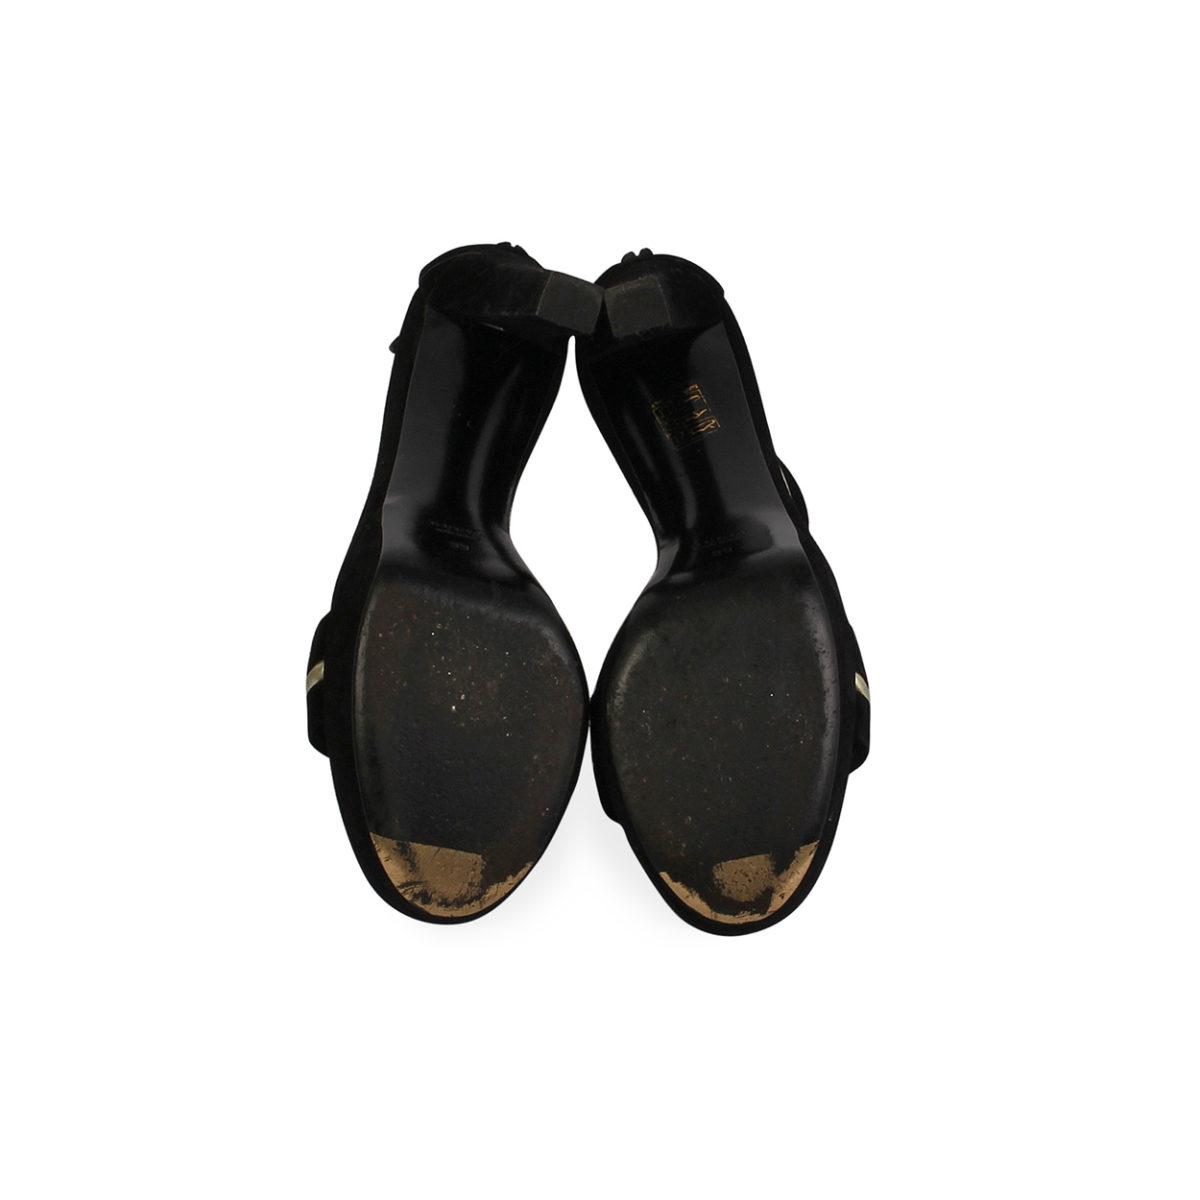 1b84ac70ee5 GUCCI Keira High Heel T-Strap Platform Sandal Black - S  39 (6)